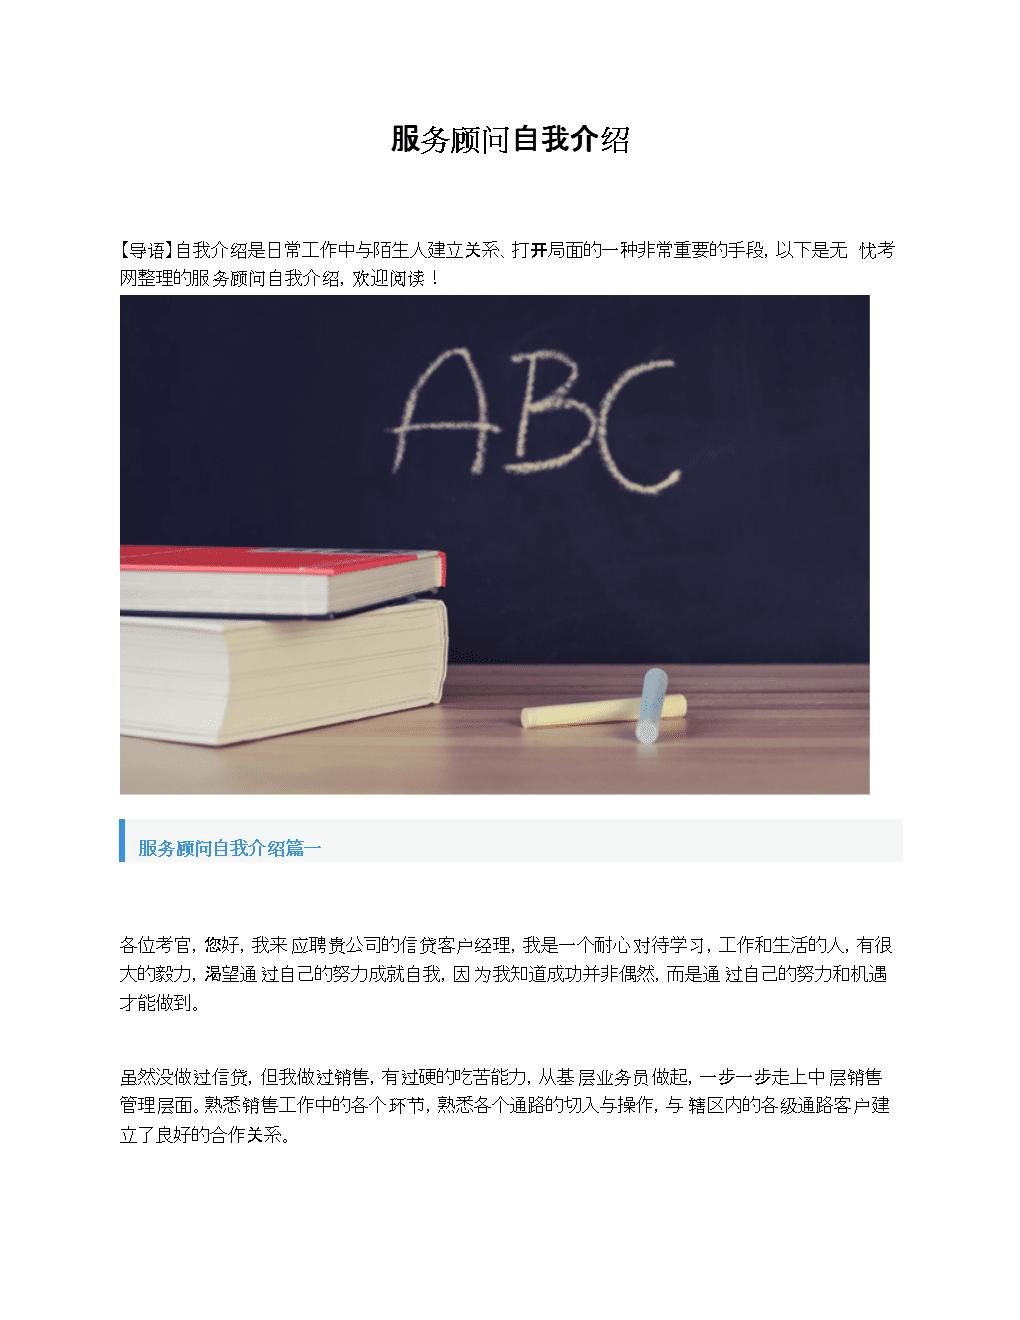 服务顾问自我介绍.doc